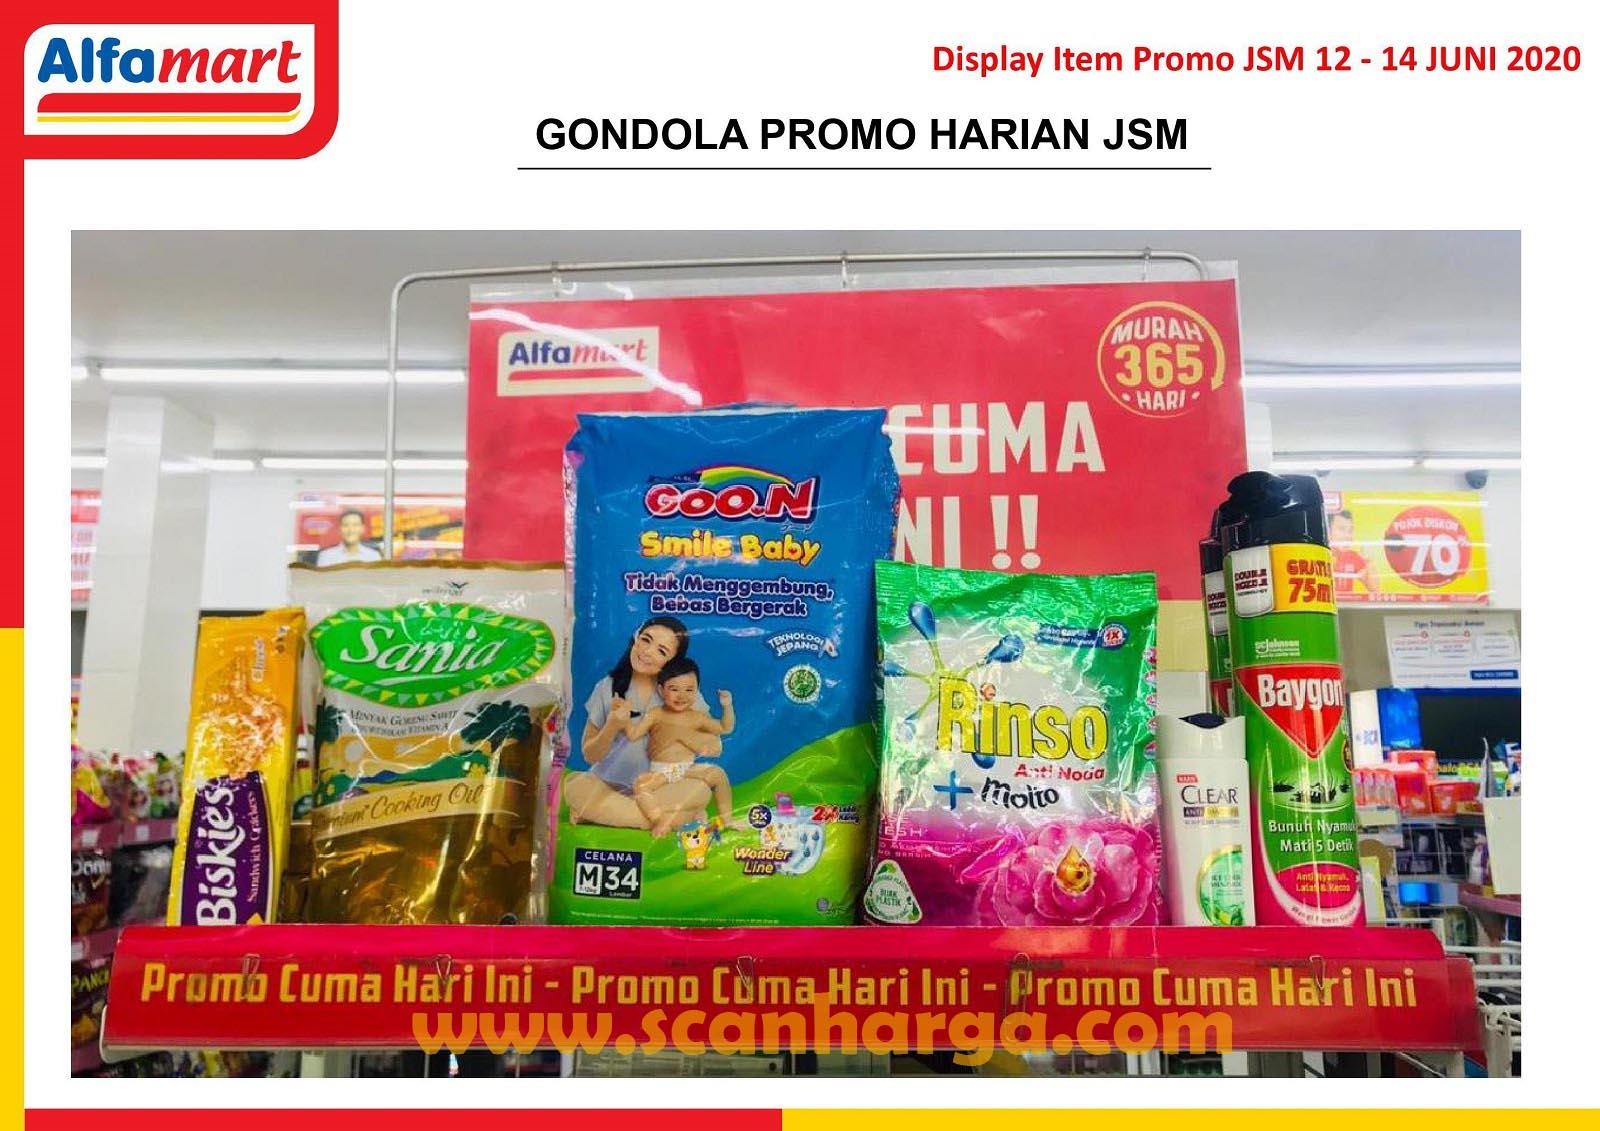 Display Gondola Item! Promo Harian JSM Alfamart 12 - 14 Juni 2020